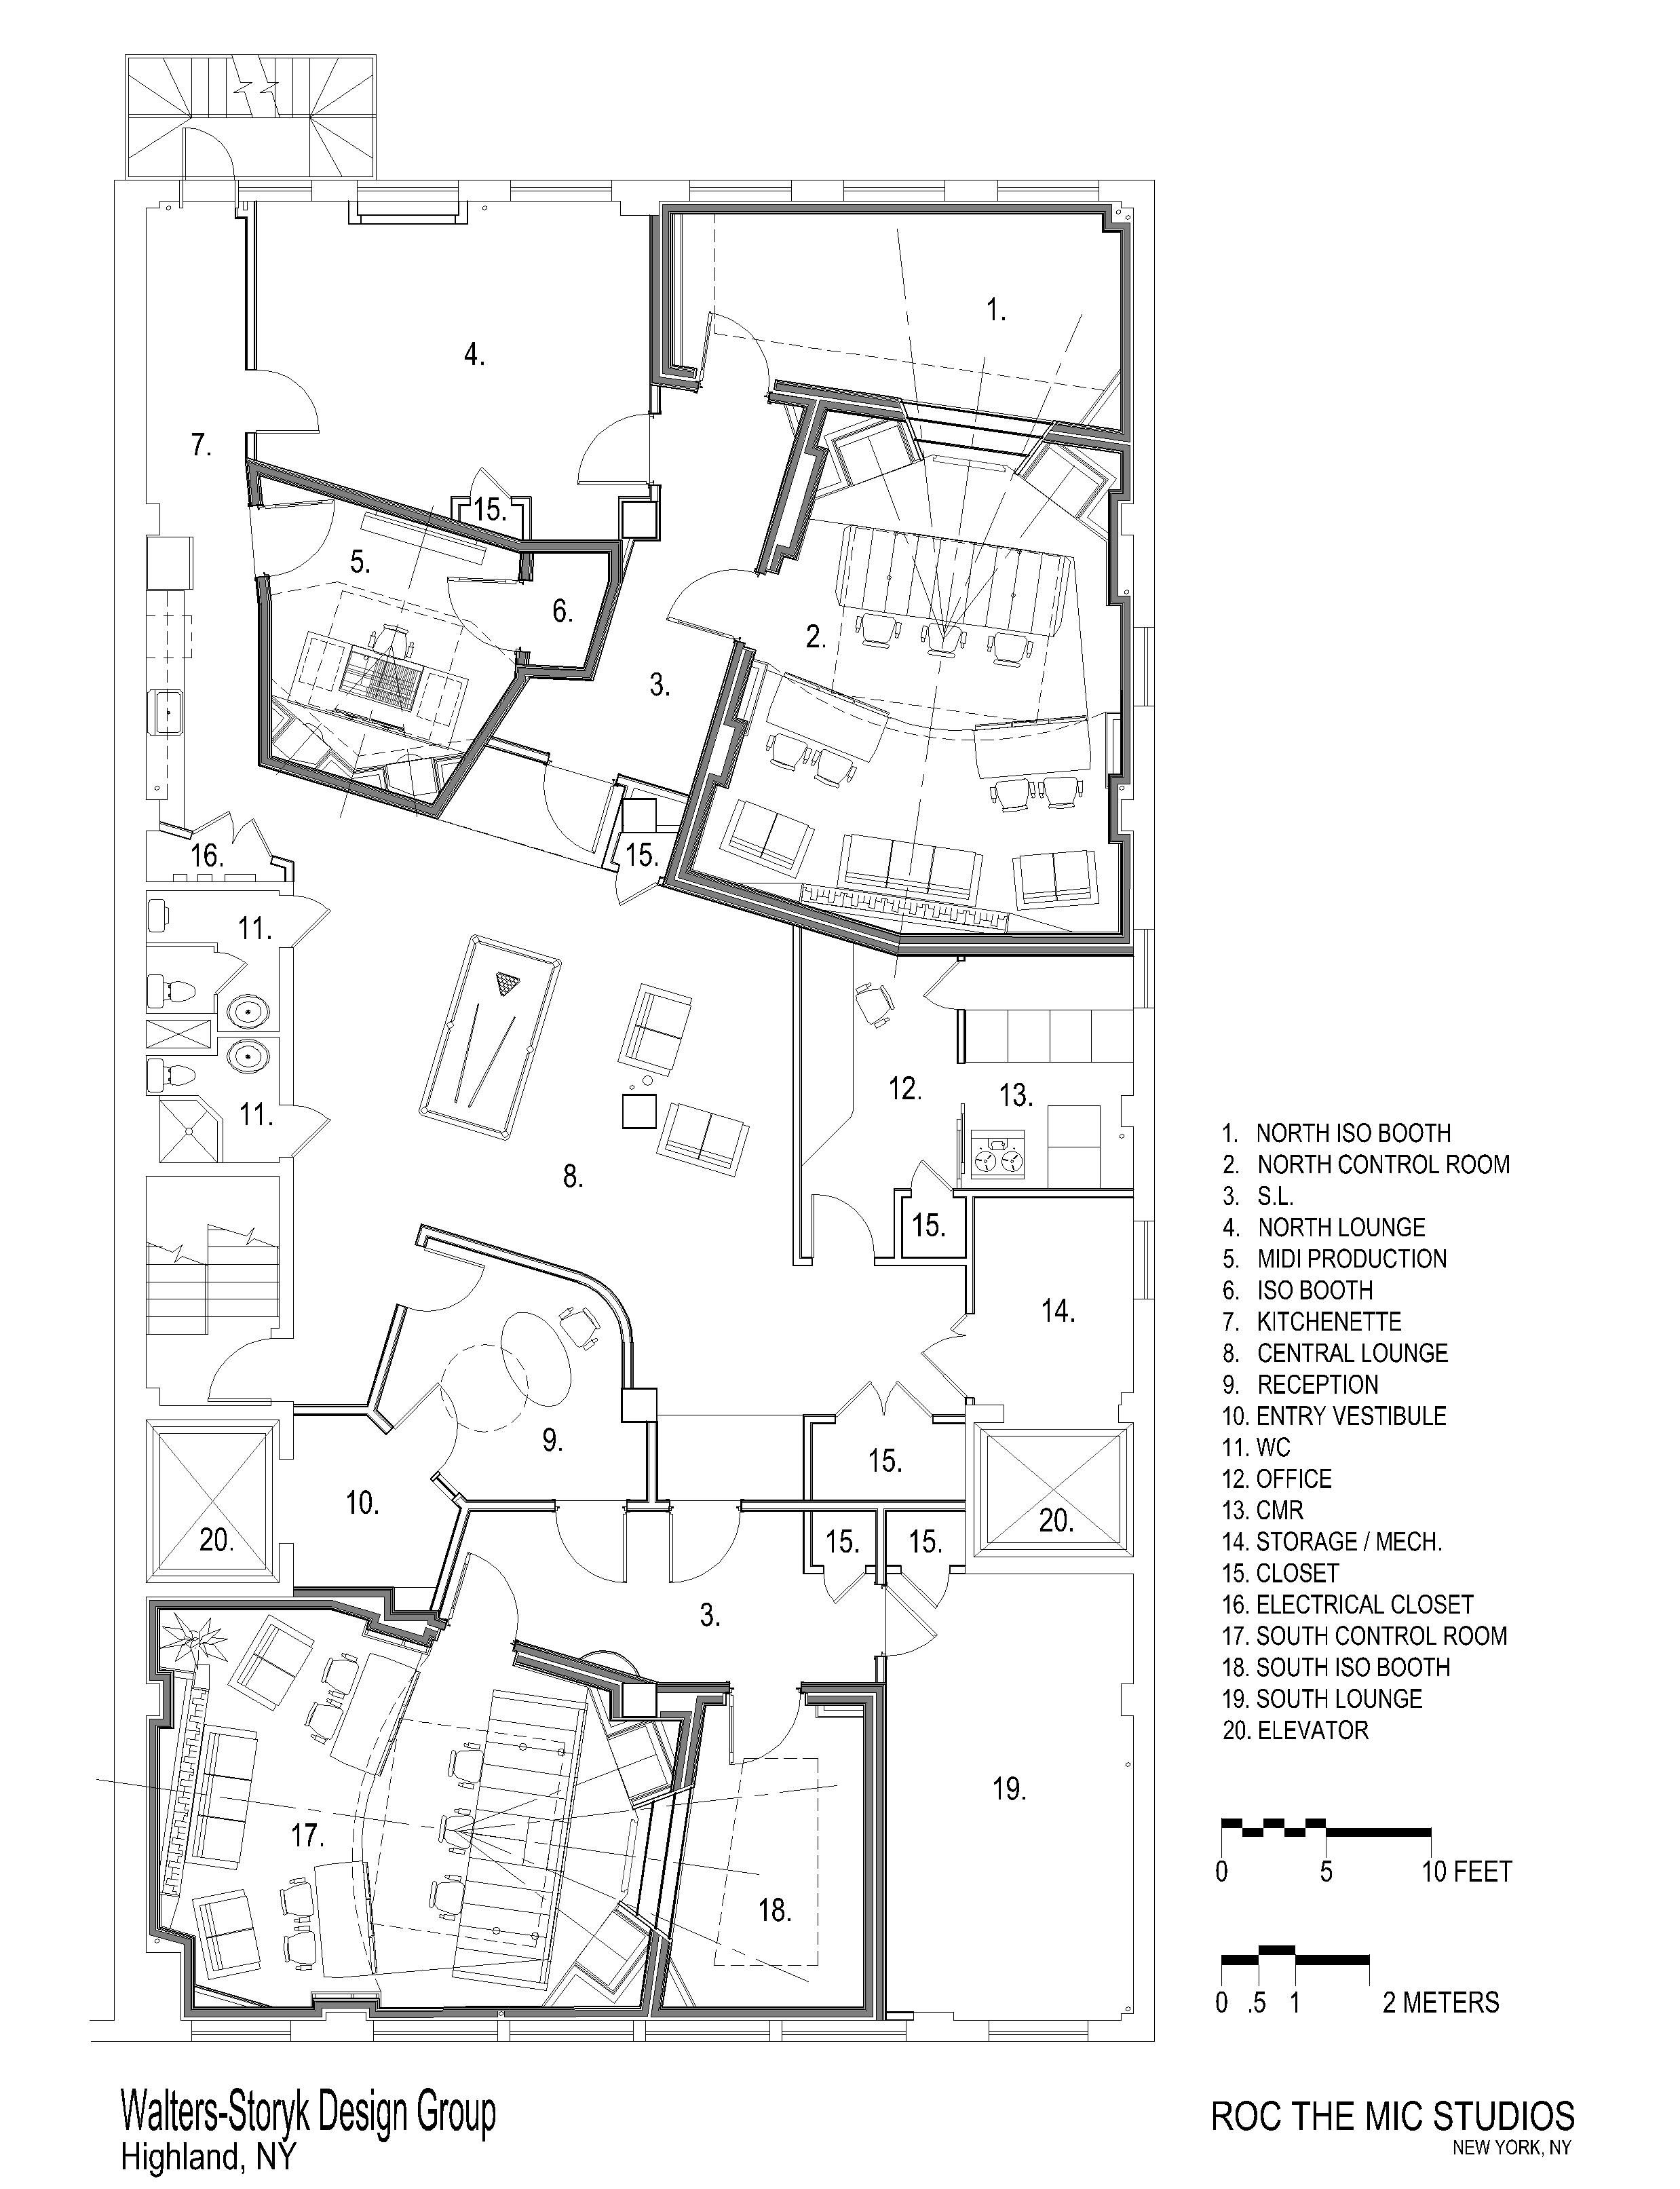 Music Studio Room Design: Roc The Mic Floor Plan, Jay Z (Roc The Mic Studios